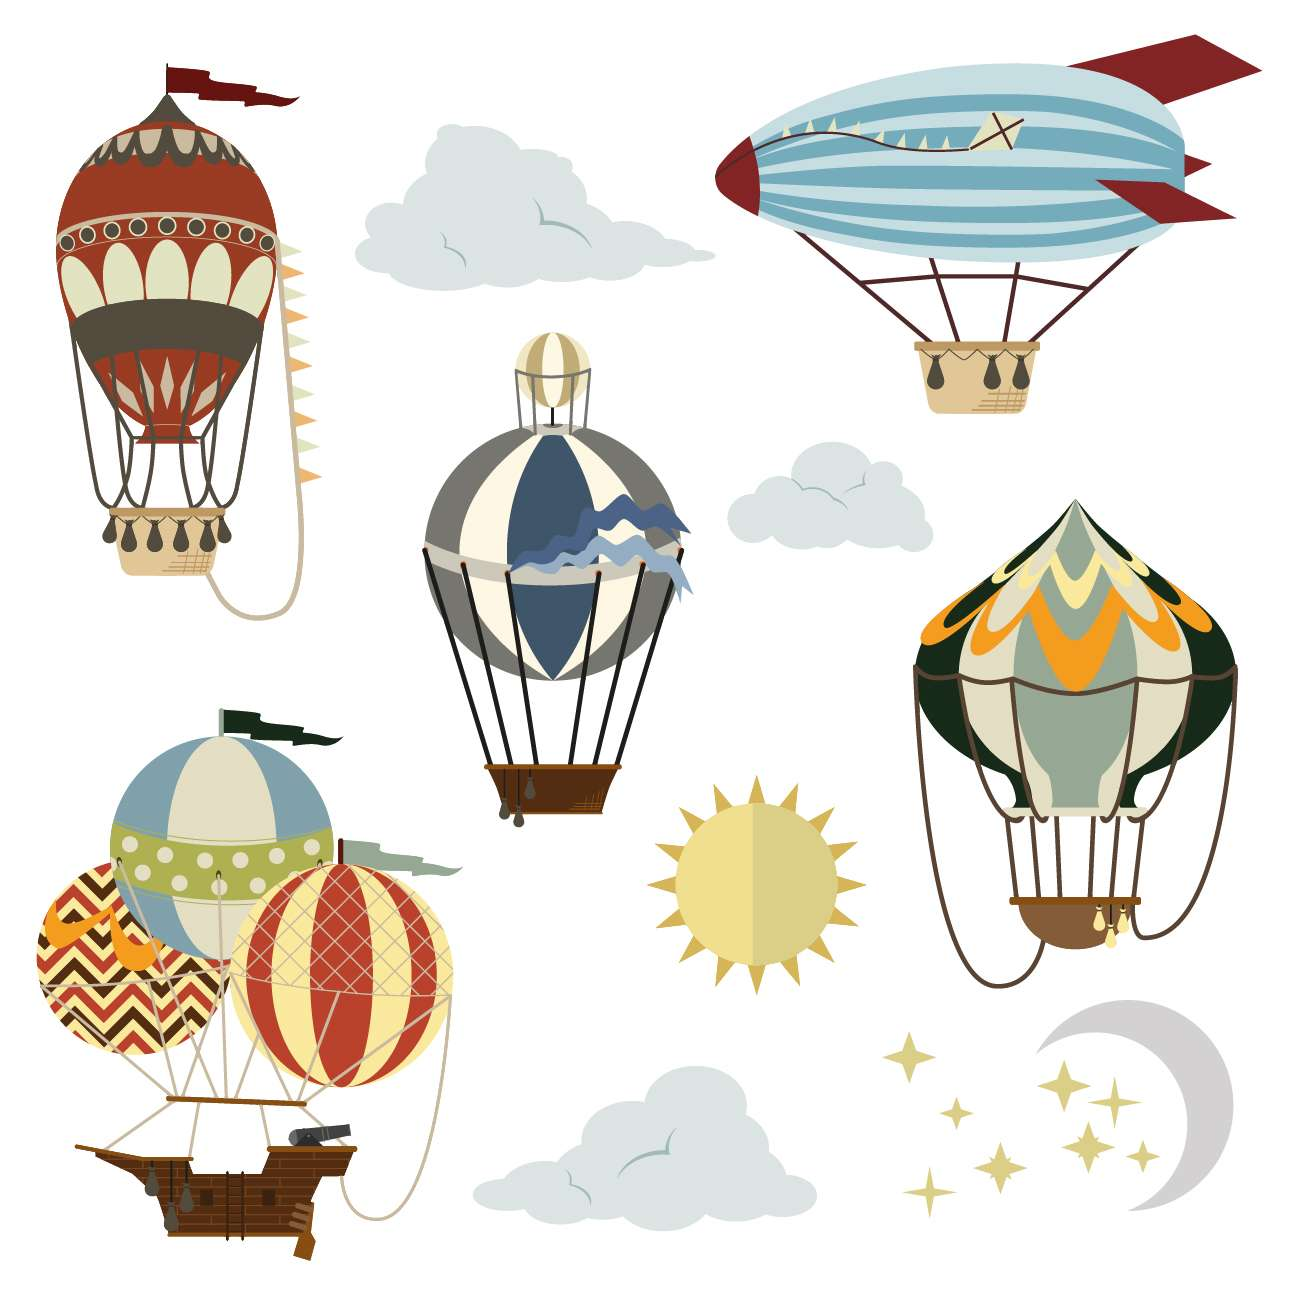 Travel Balloons sticker set